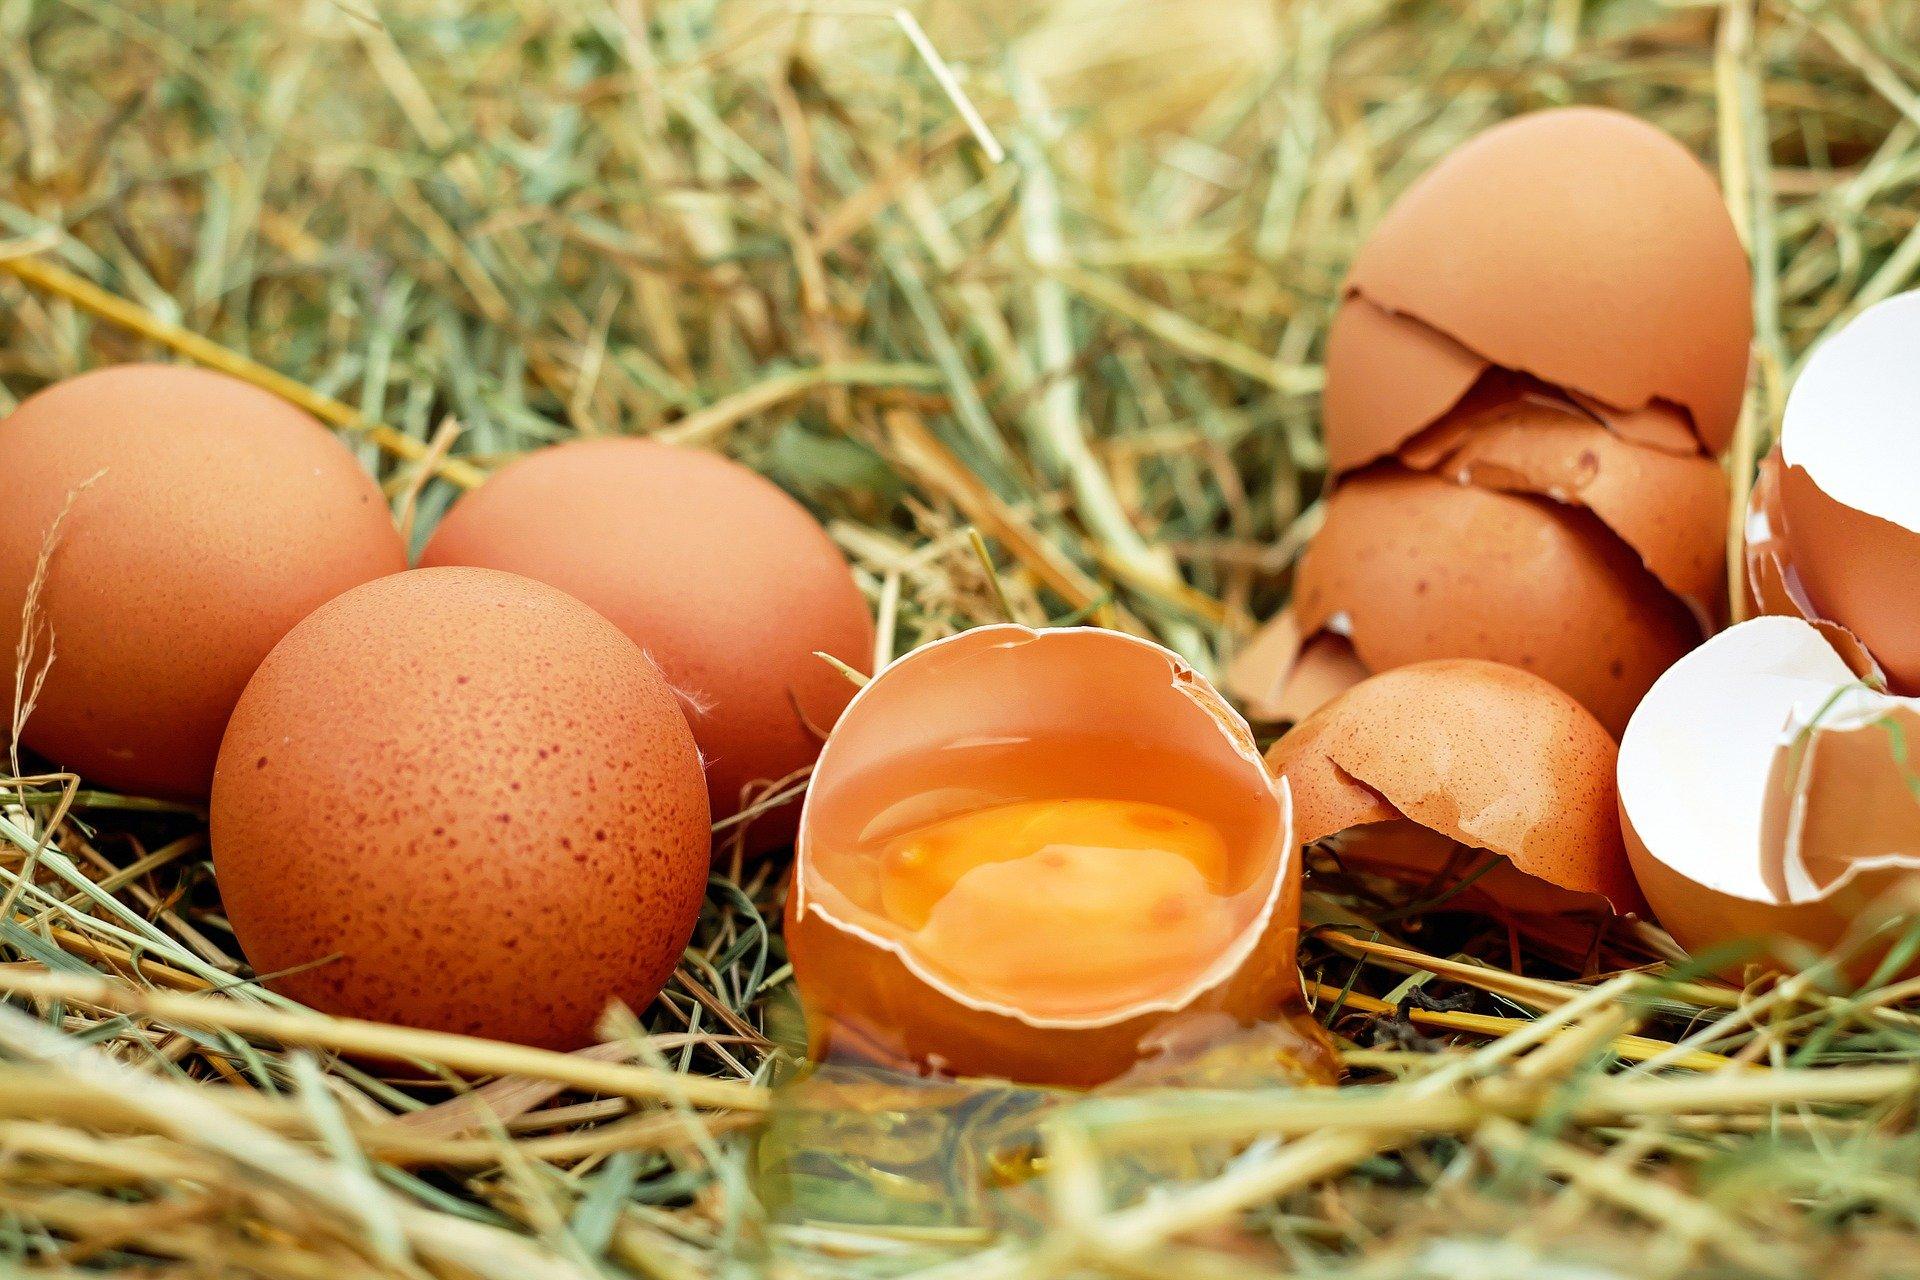 eggs 1510449 1920